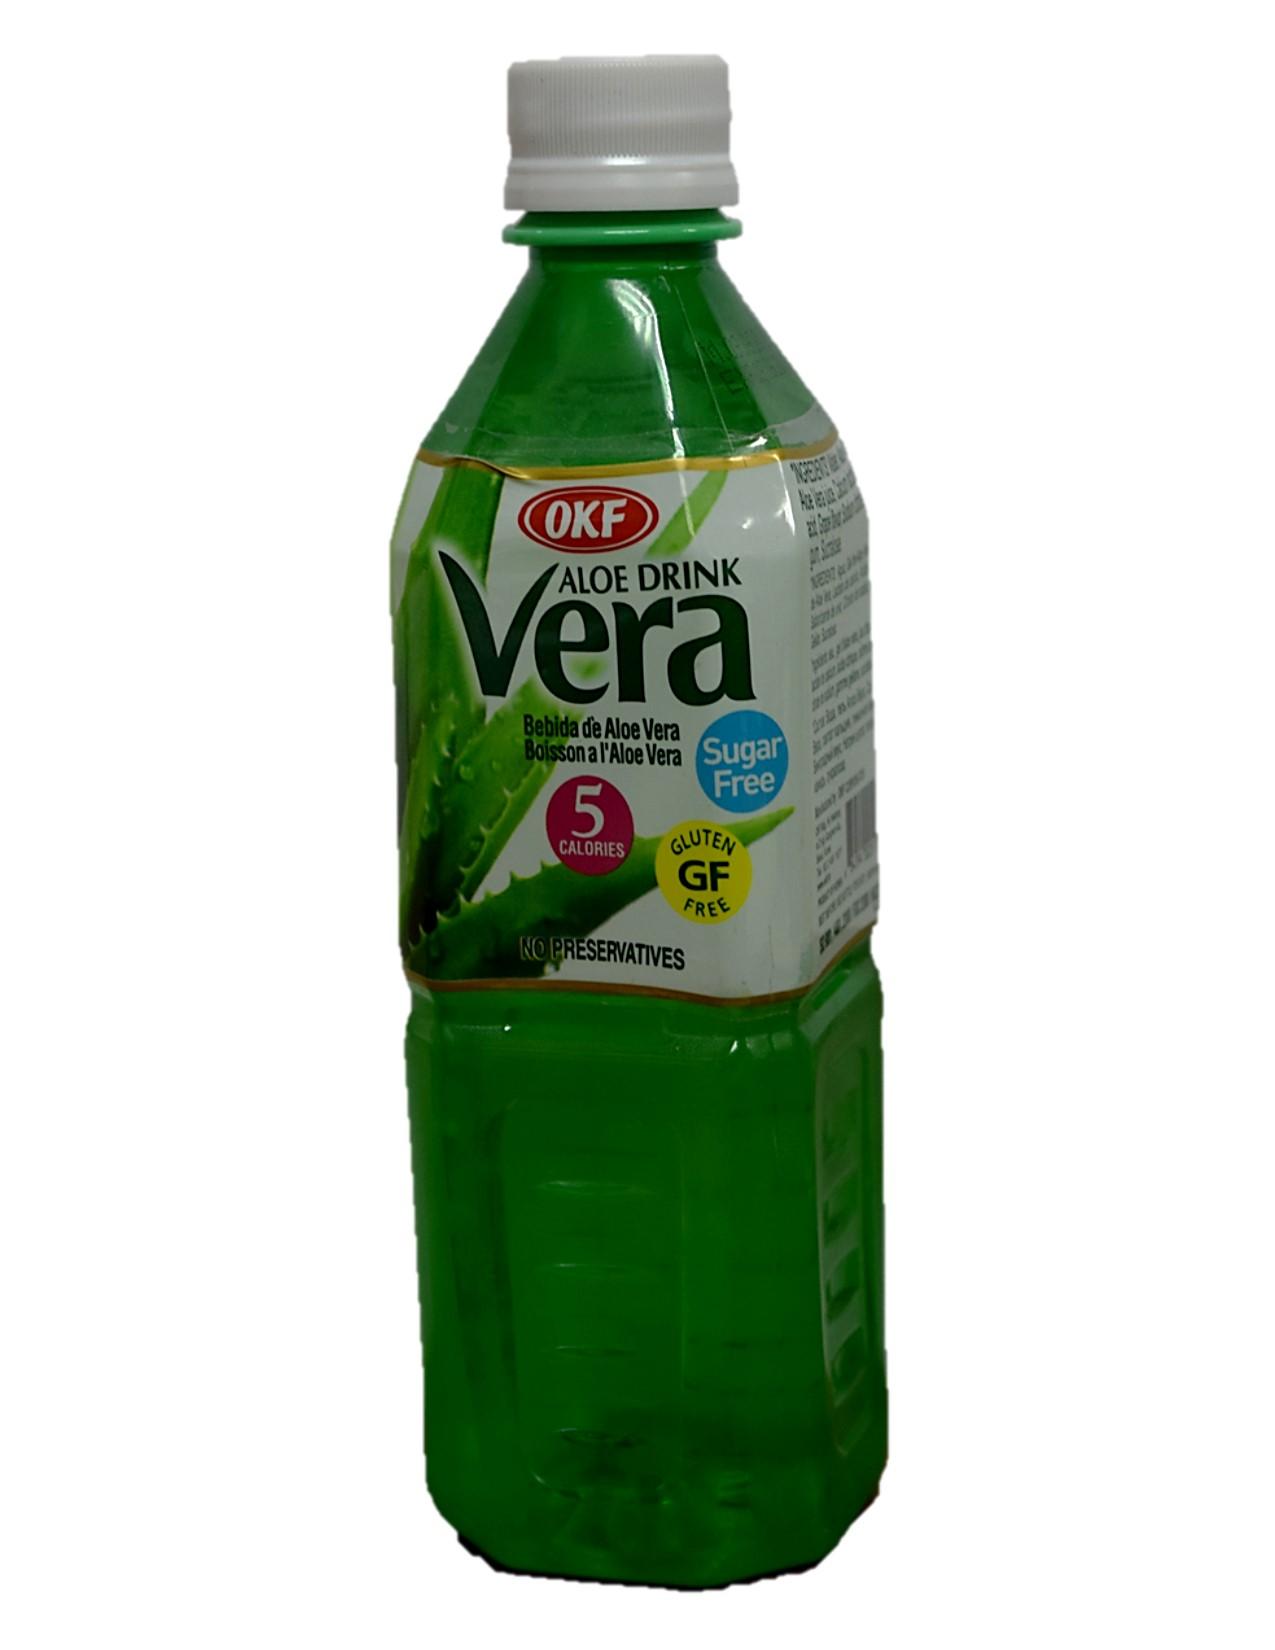 OKF Aloe Vera Original - Sugar Free 500ml